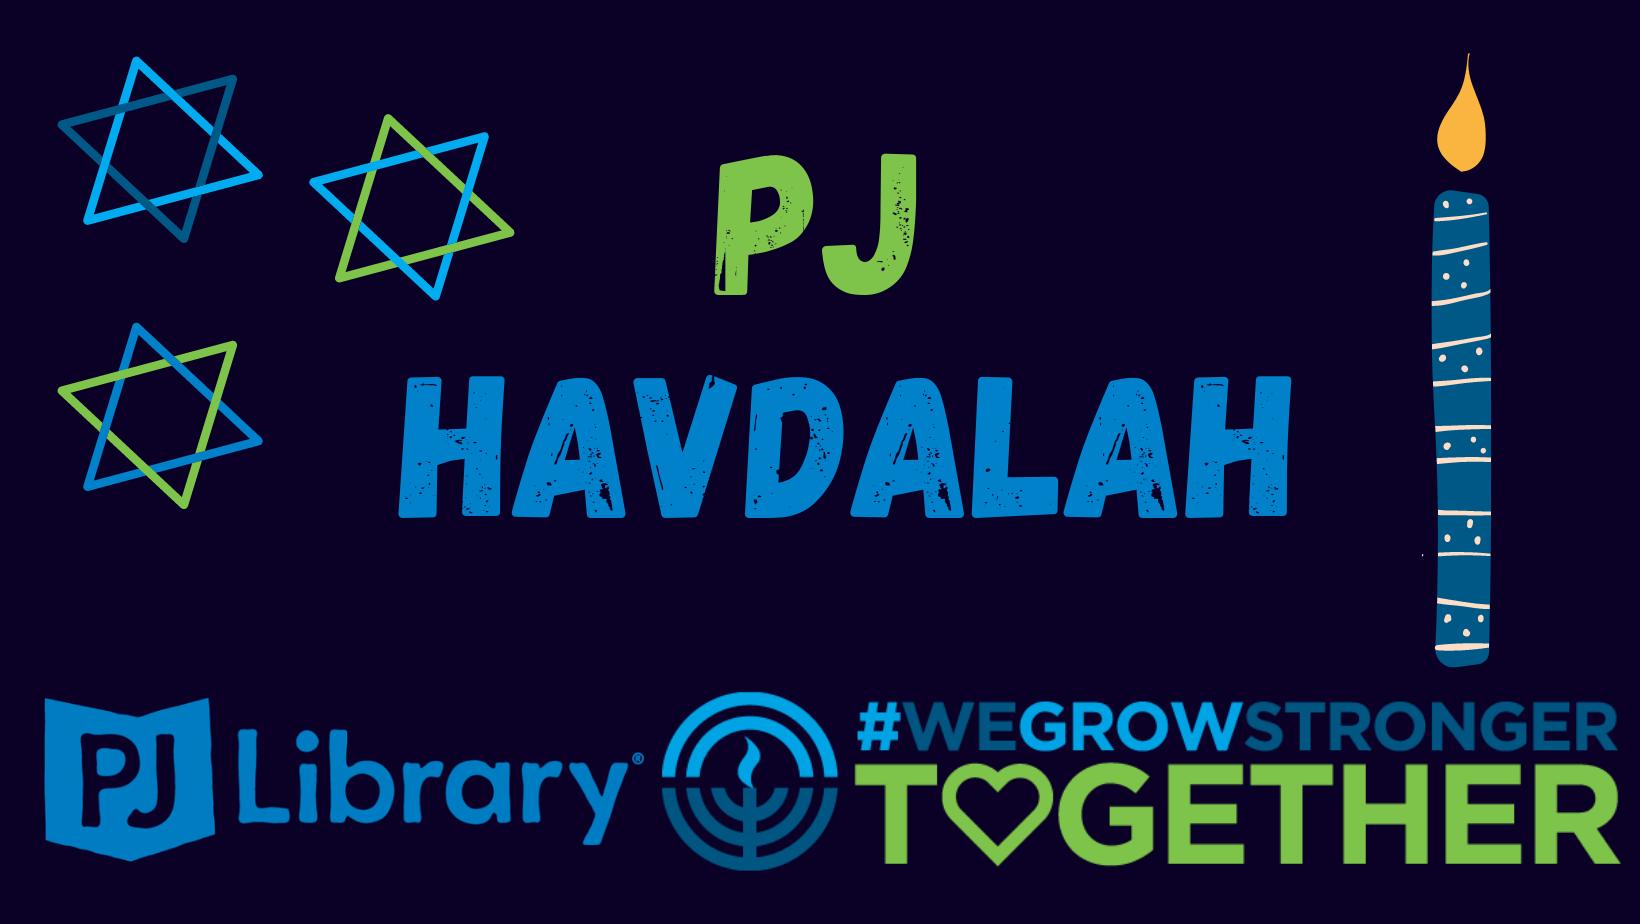 PJ Library Havdalah